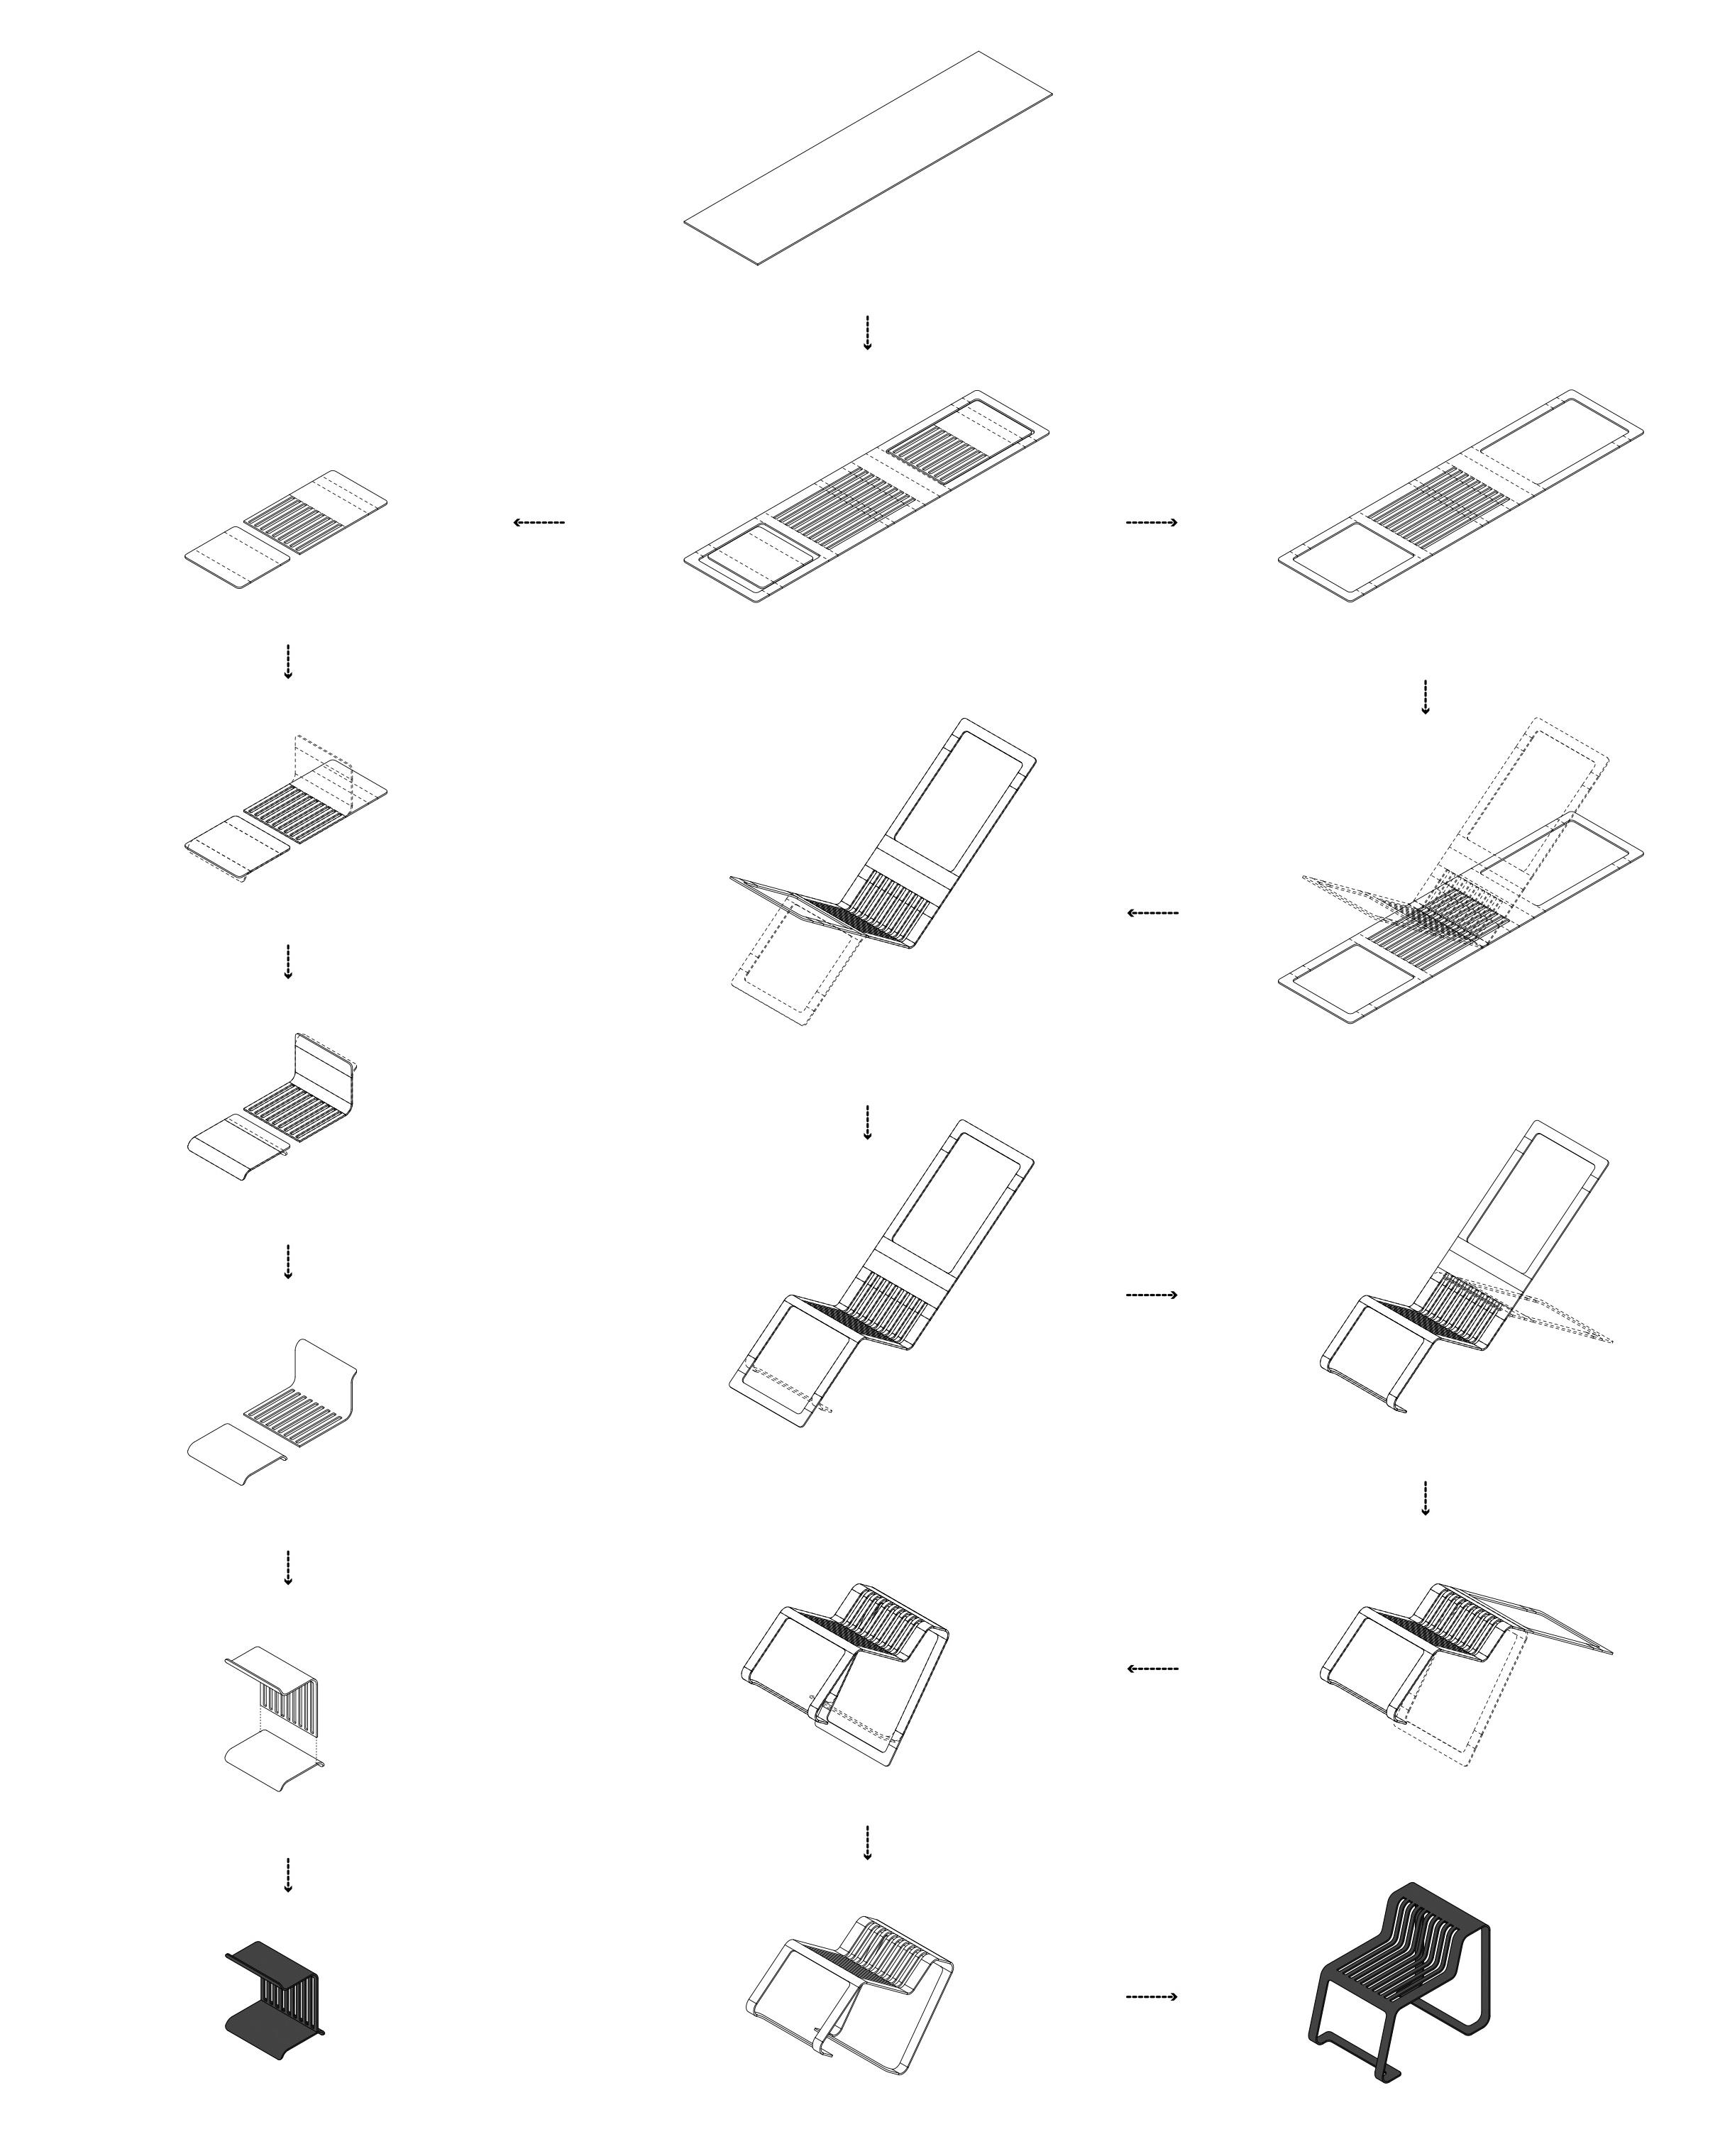 hwim diagram_02.jpg